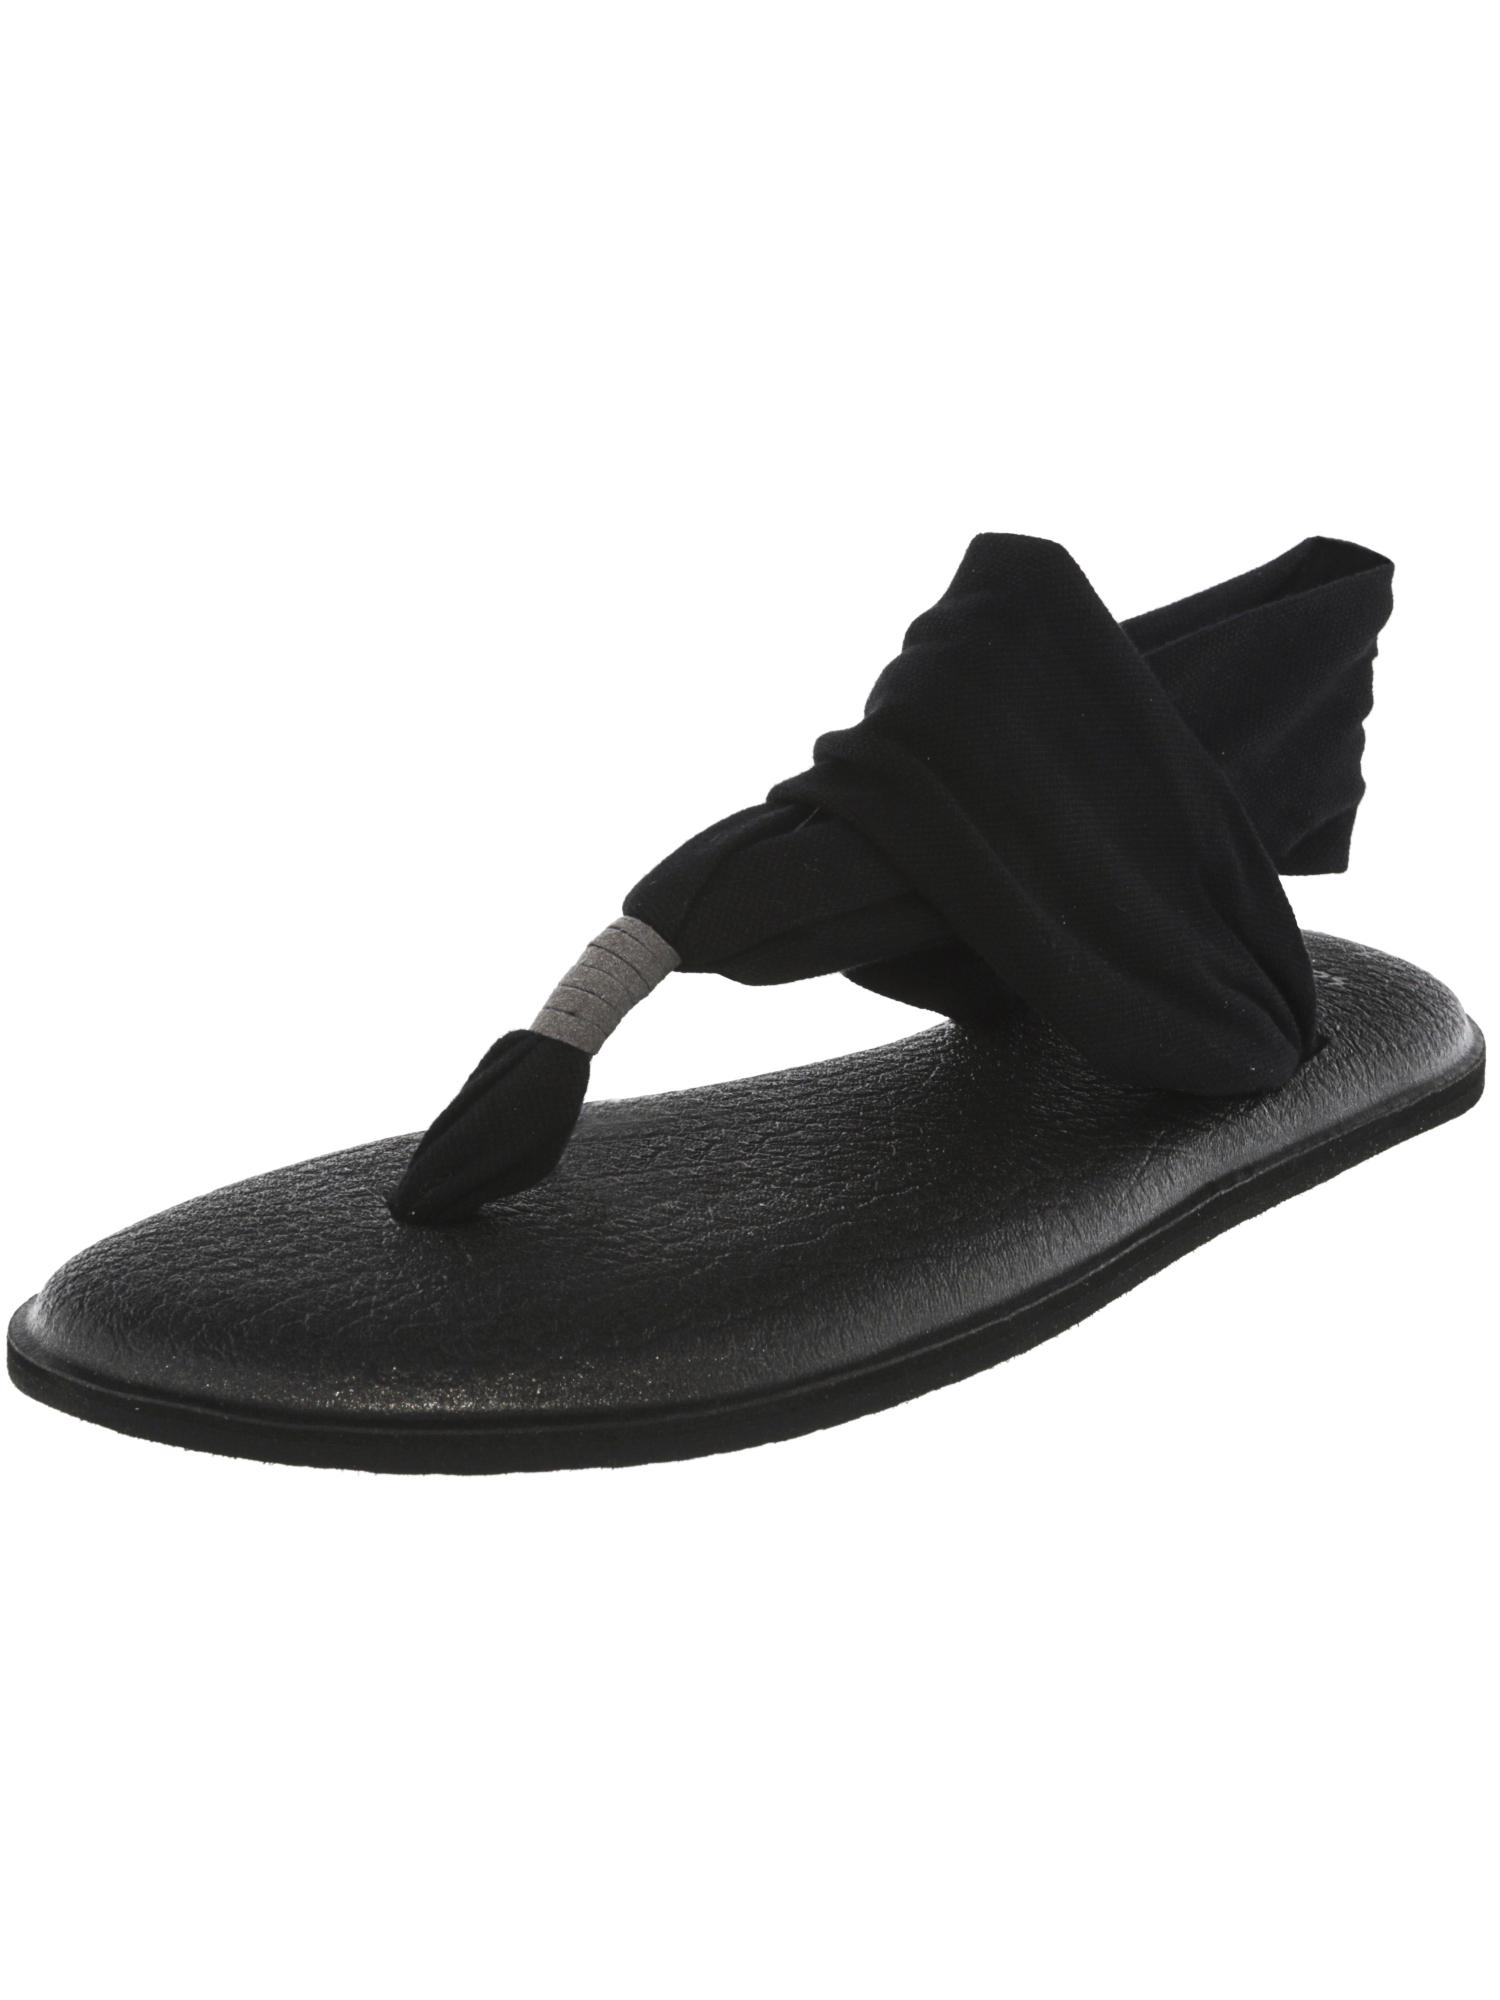 Sanuk Women's Yoga Sling Slingback Sandal,Grey,8 M US